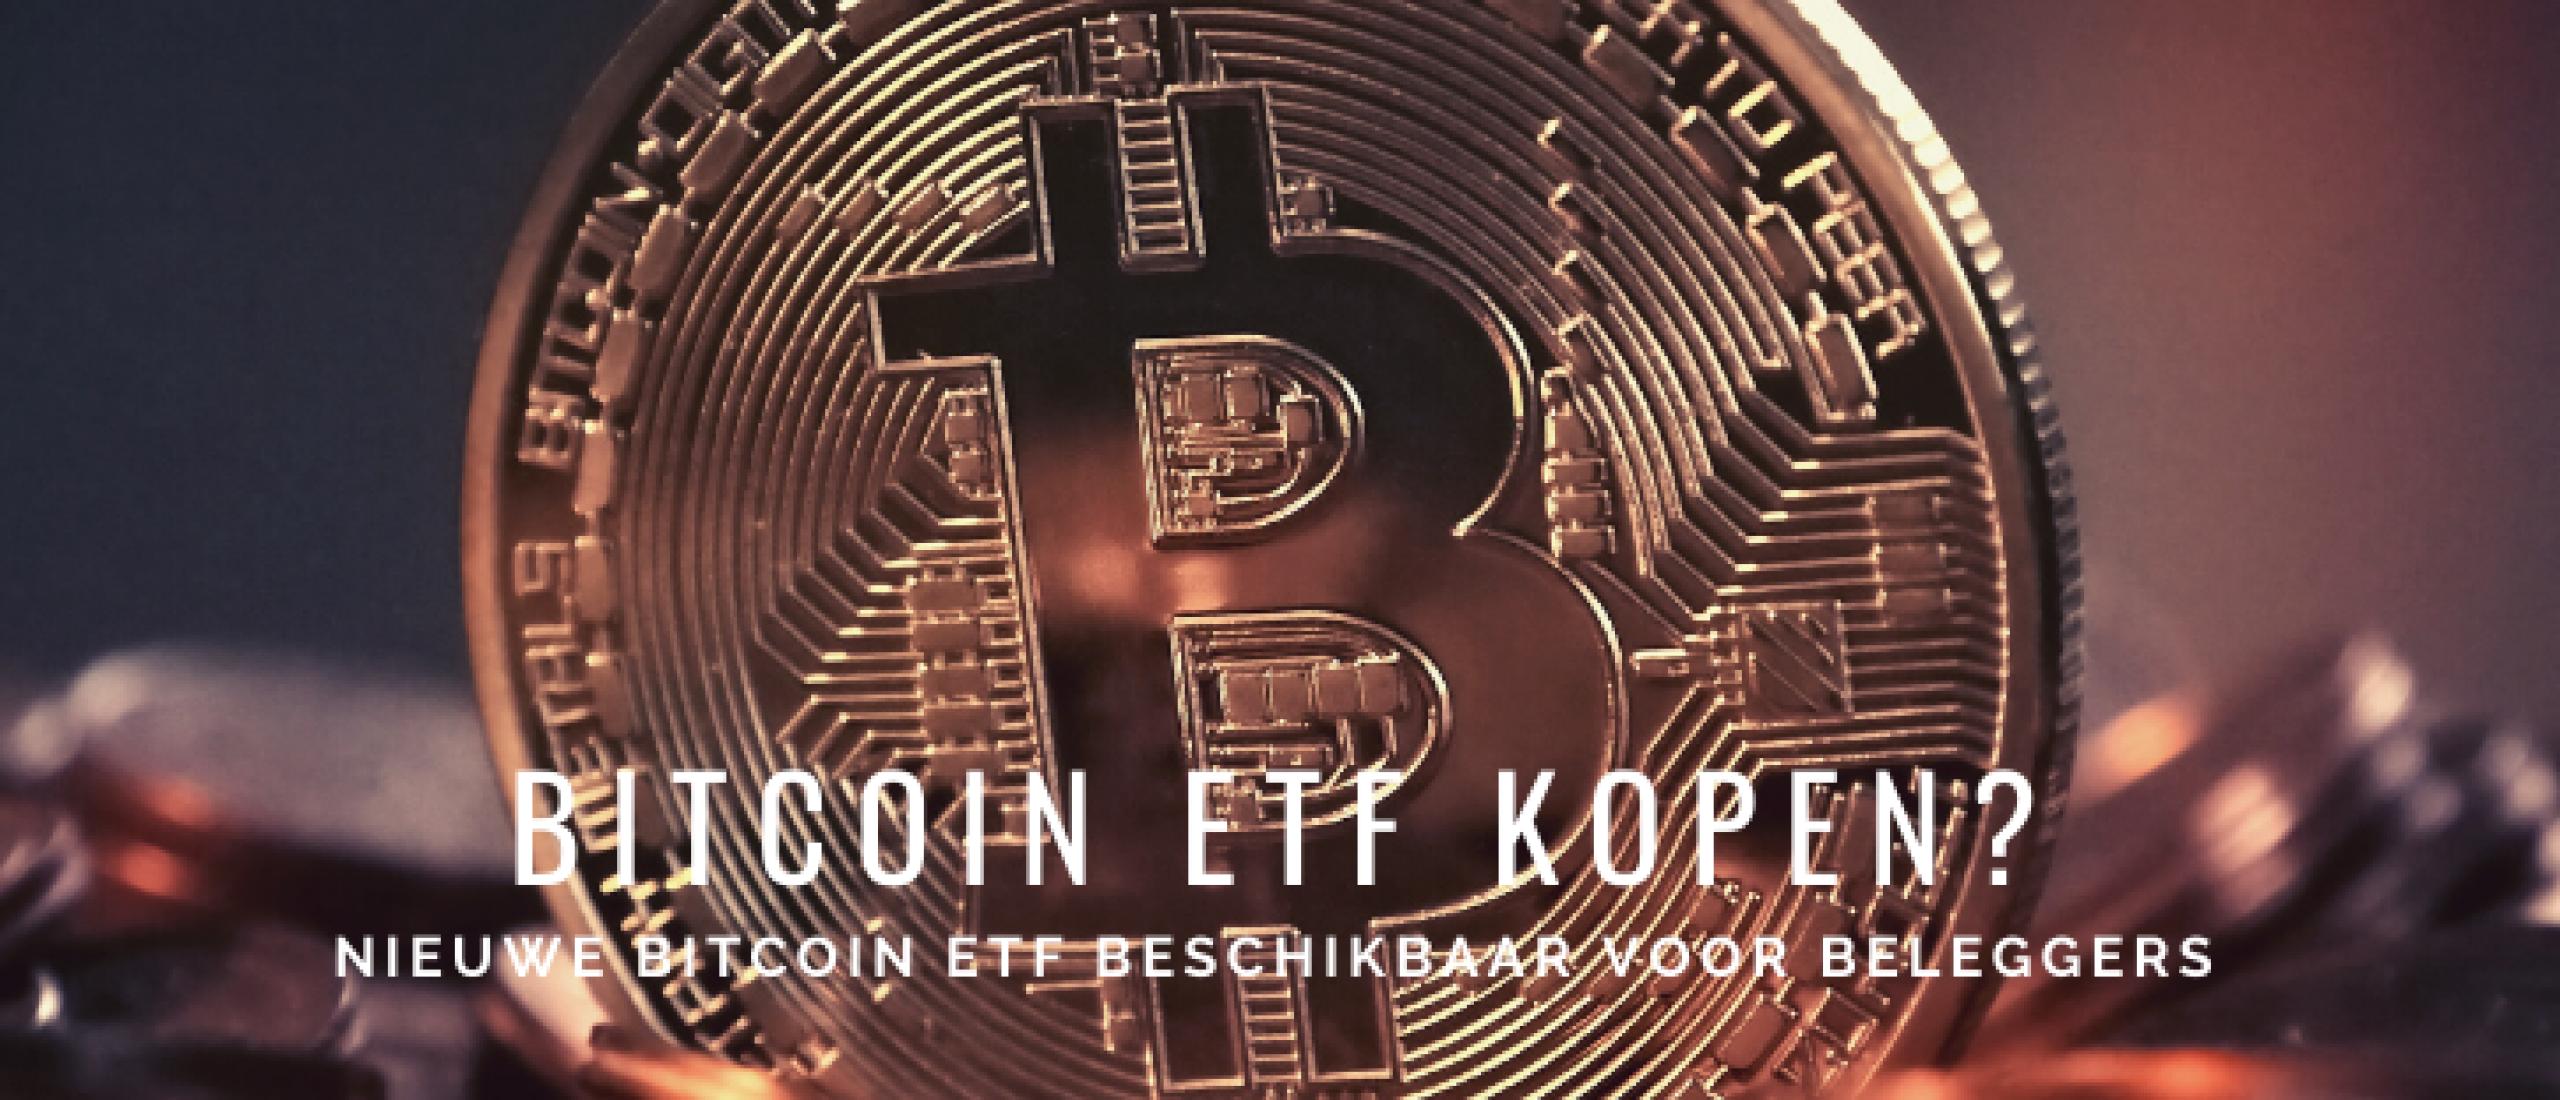 Bitcoin ETF Kopen? Nieuw: ProShares Bitcoin Strategy ETF